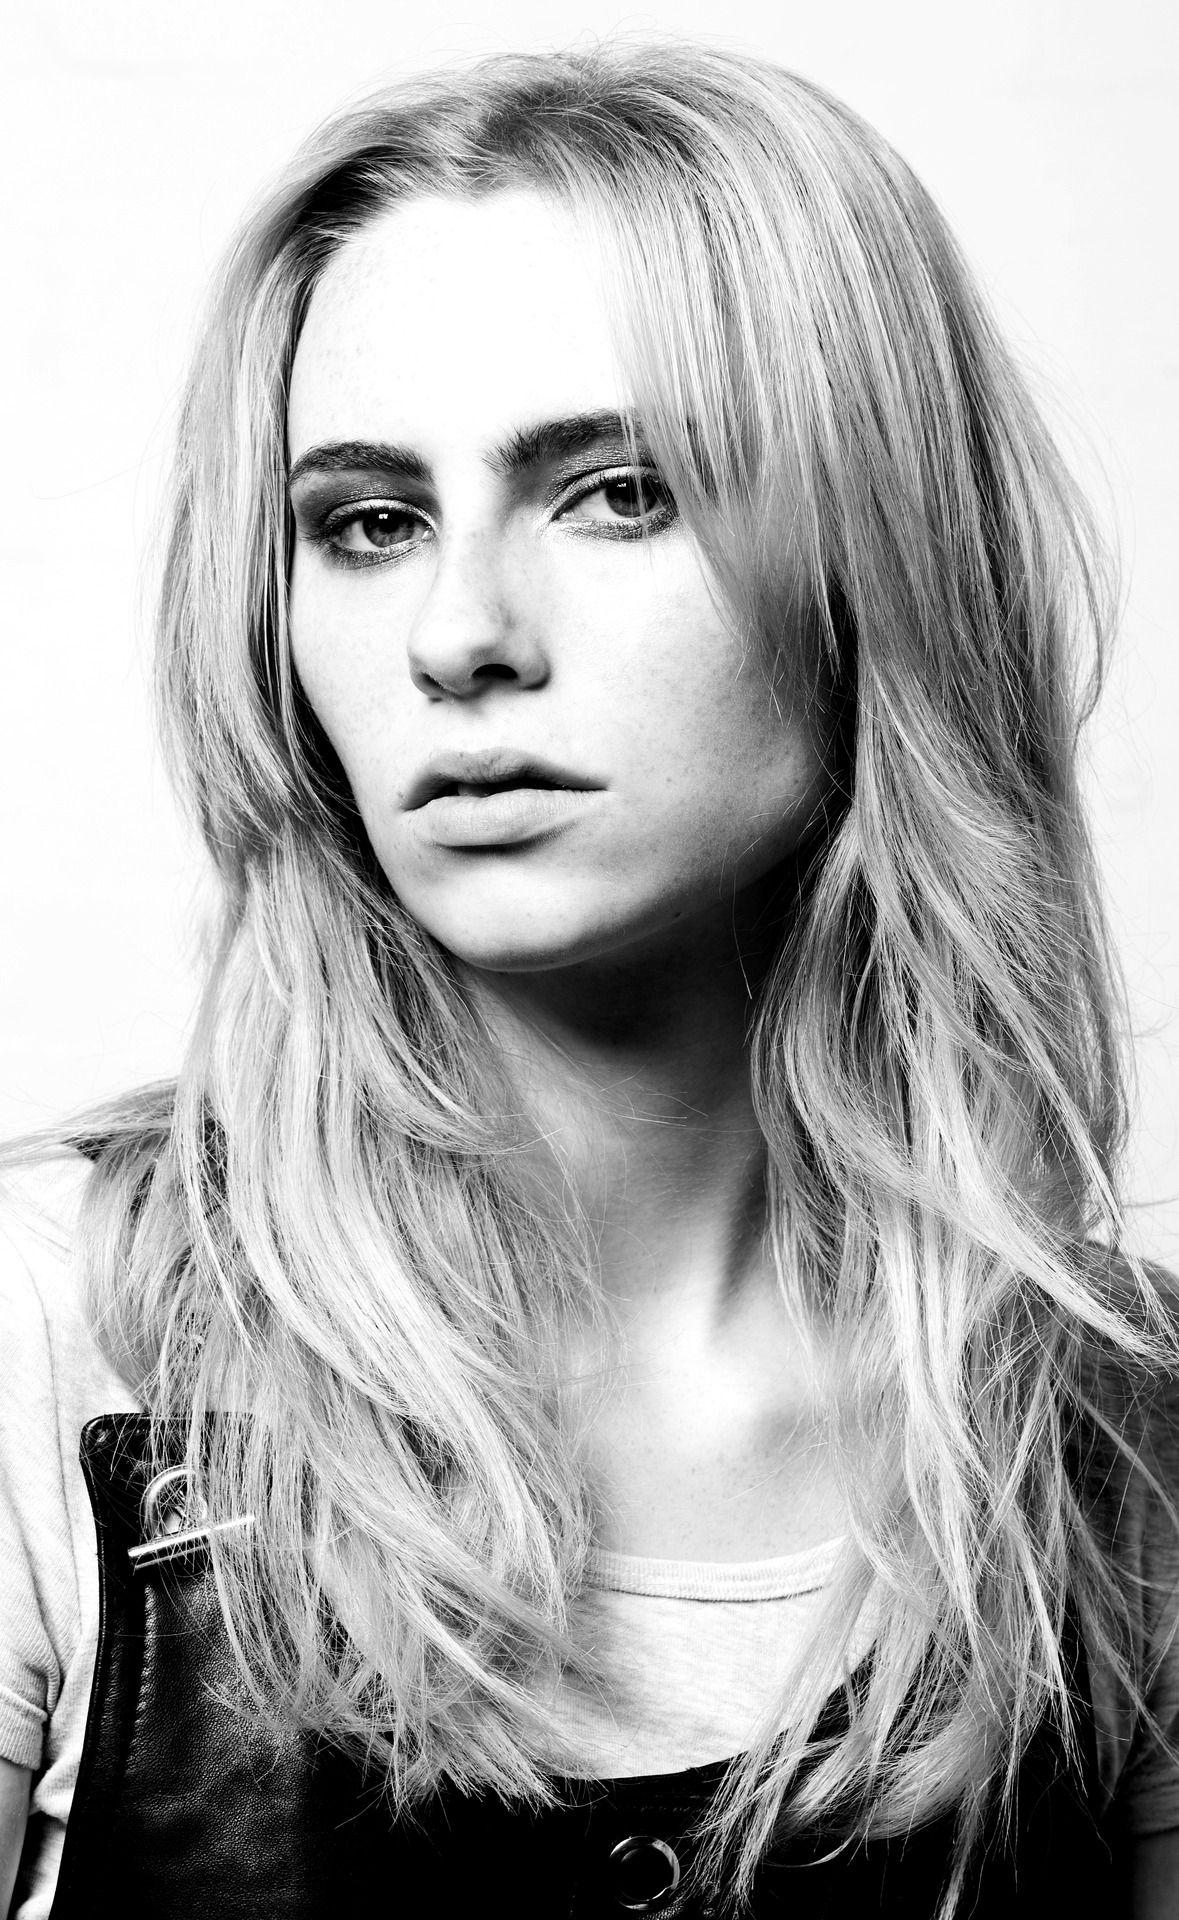 shannon @ elite model management    headshot from Danielle Foster SS 13 lookbook